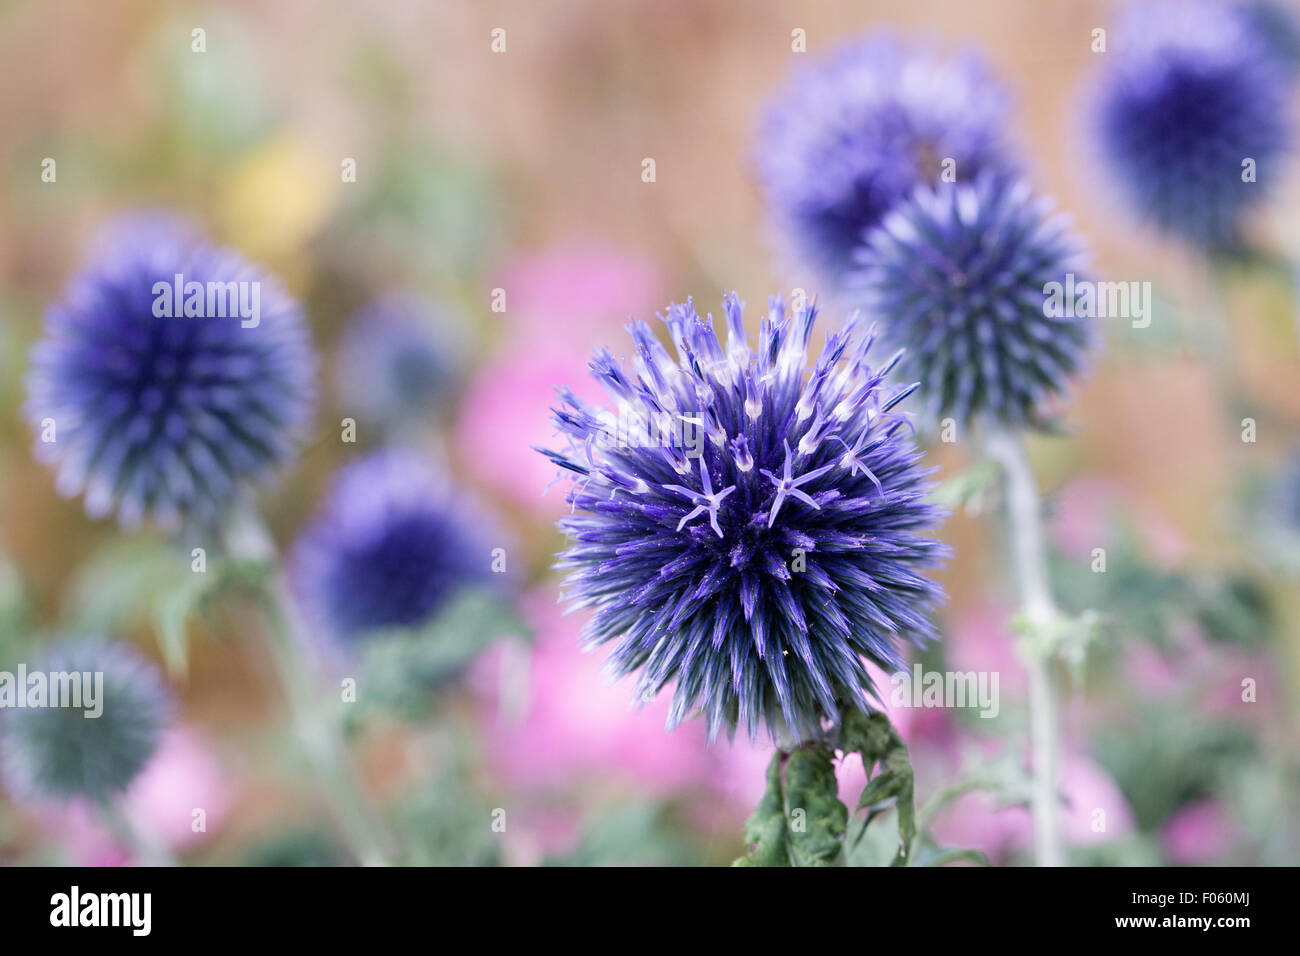 Echinops ritro 'Veitch's Blue' flower. Globe thistle flower. - Stock Image